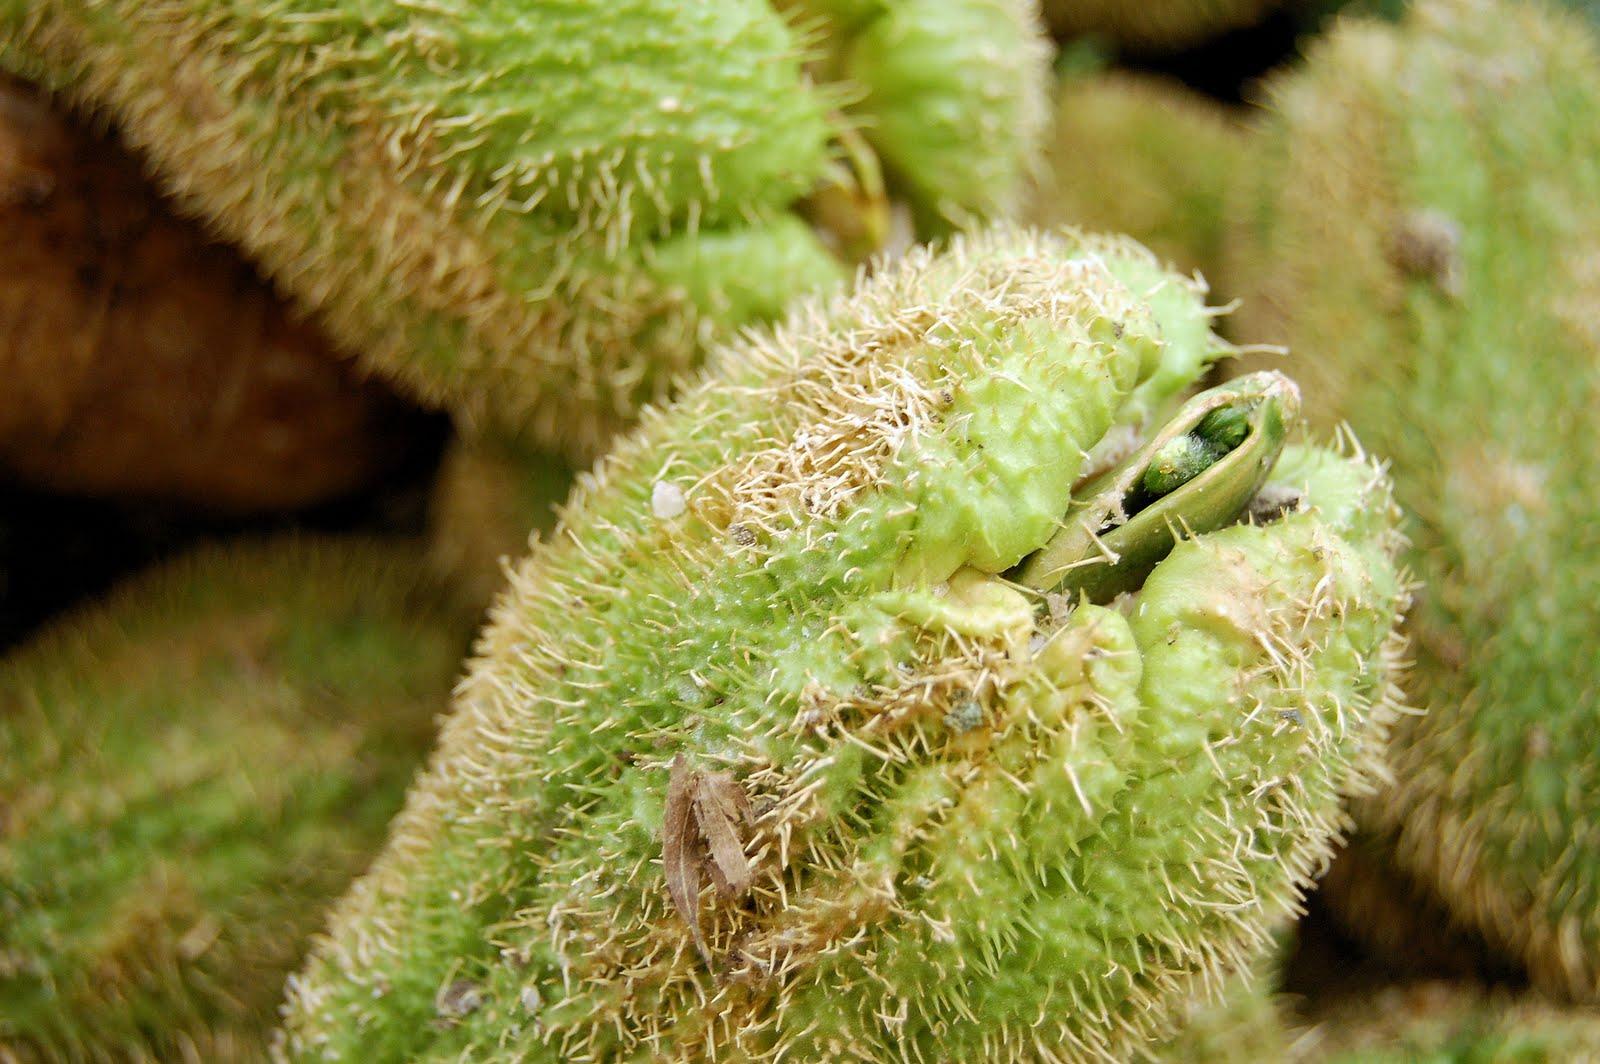 Garden adventures chayote sechium edule - Spiny Chayote Www Imgkid Com The Image Kid Has It